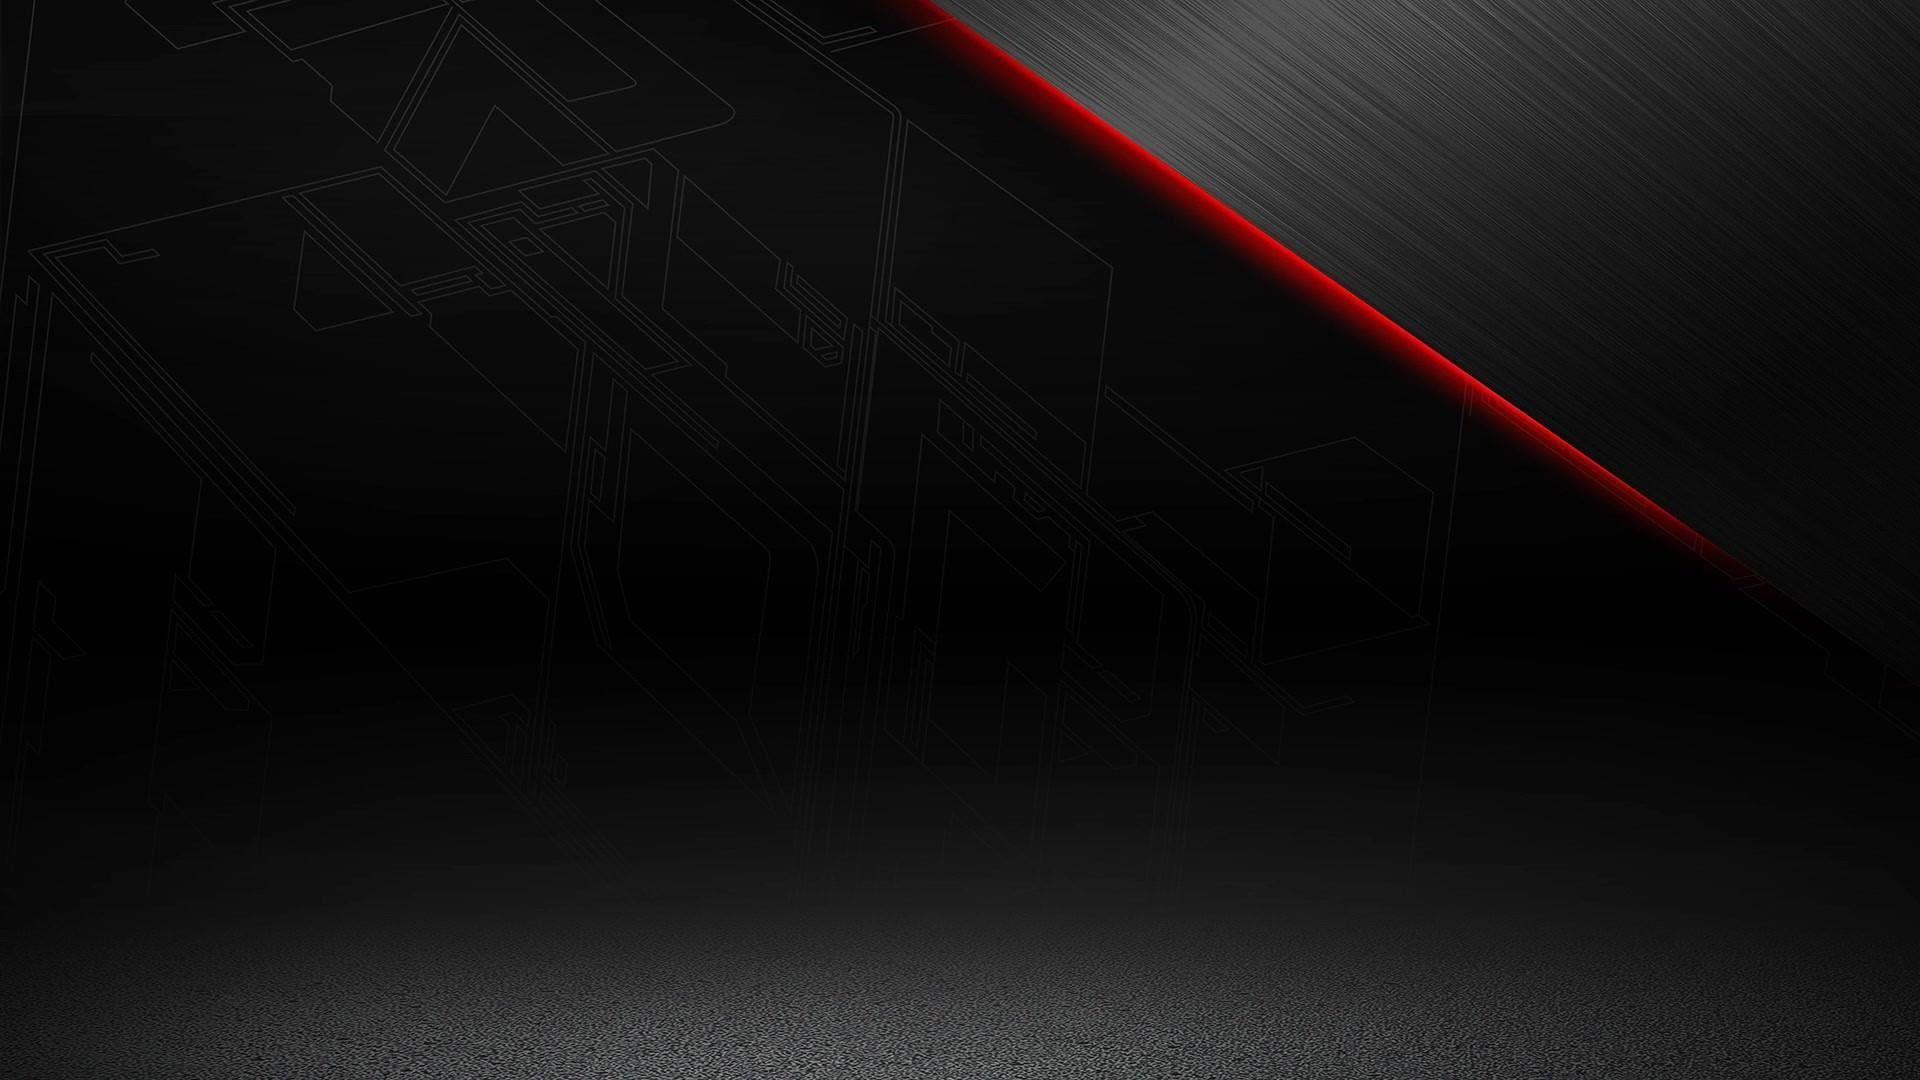 Black Red Line 1080p Wallpaper Hdwallpaper Desktop Wallpaper Hd Wallpaper Architecture Wallpaper